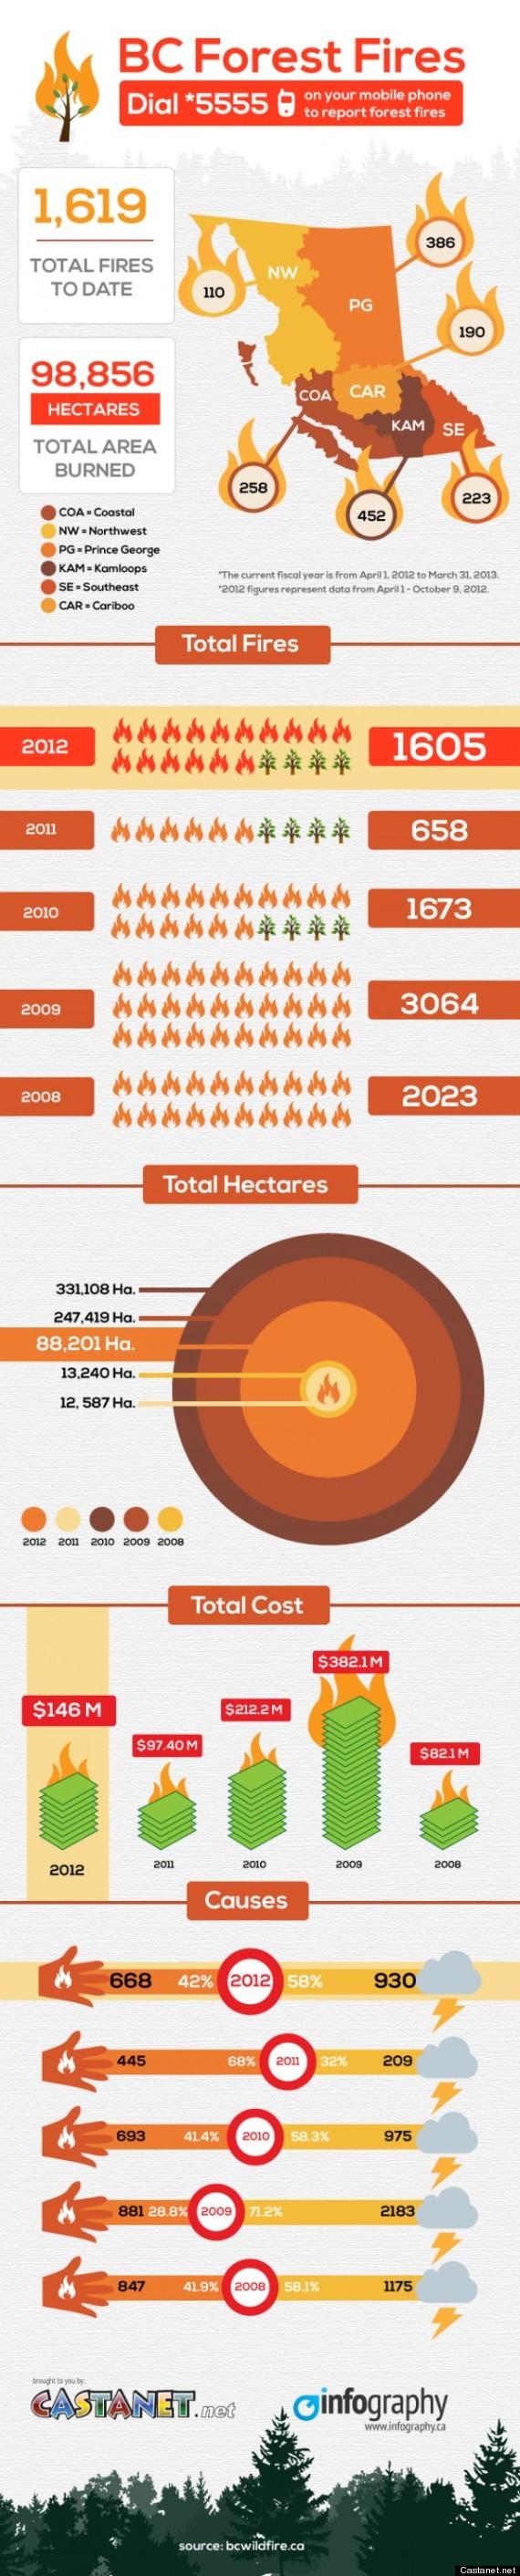 okanagan fire infographic